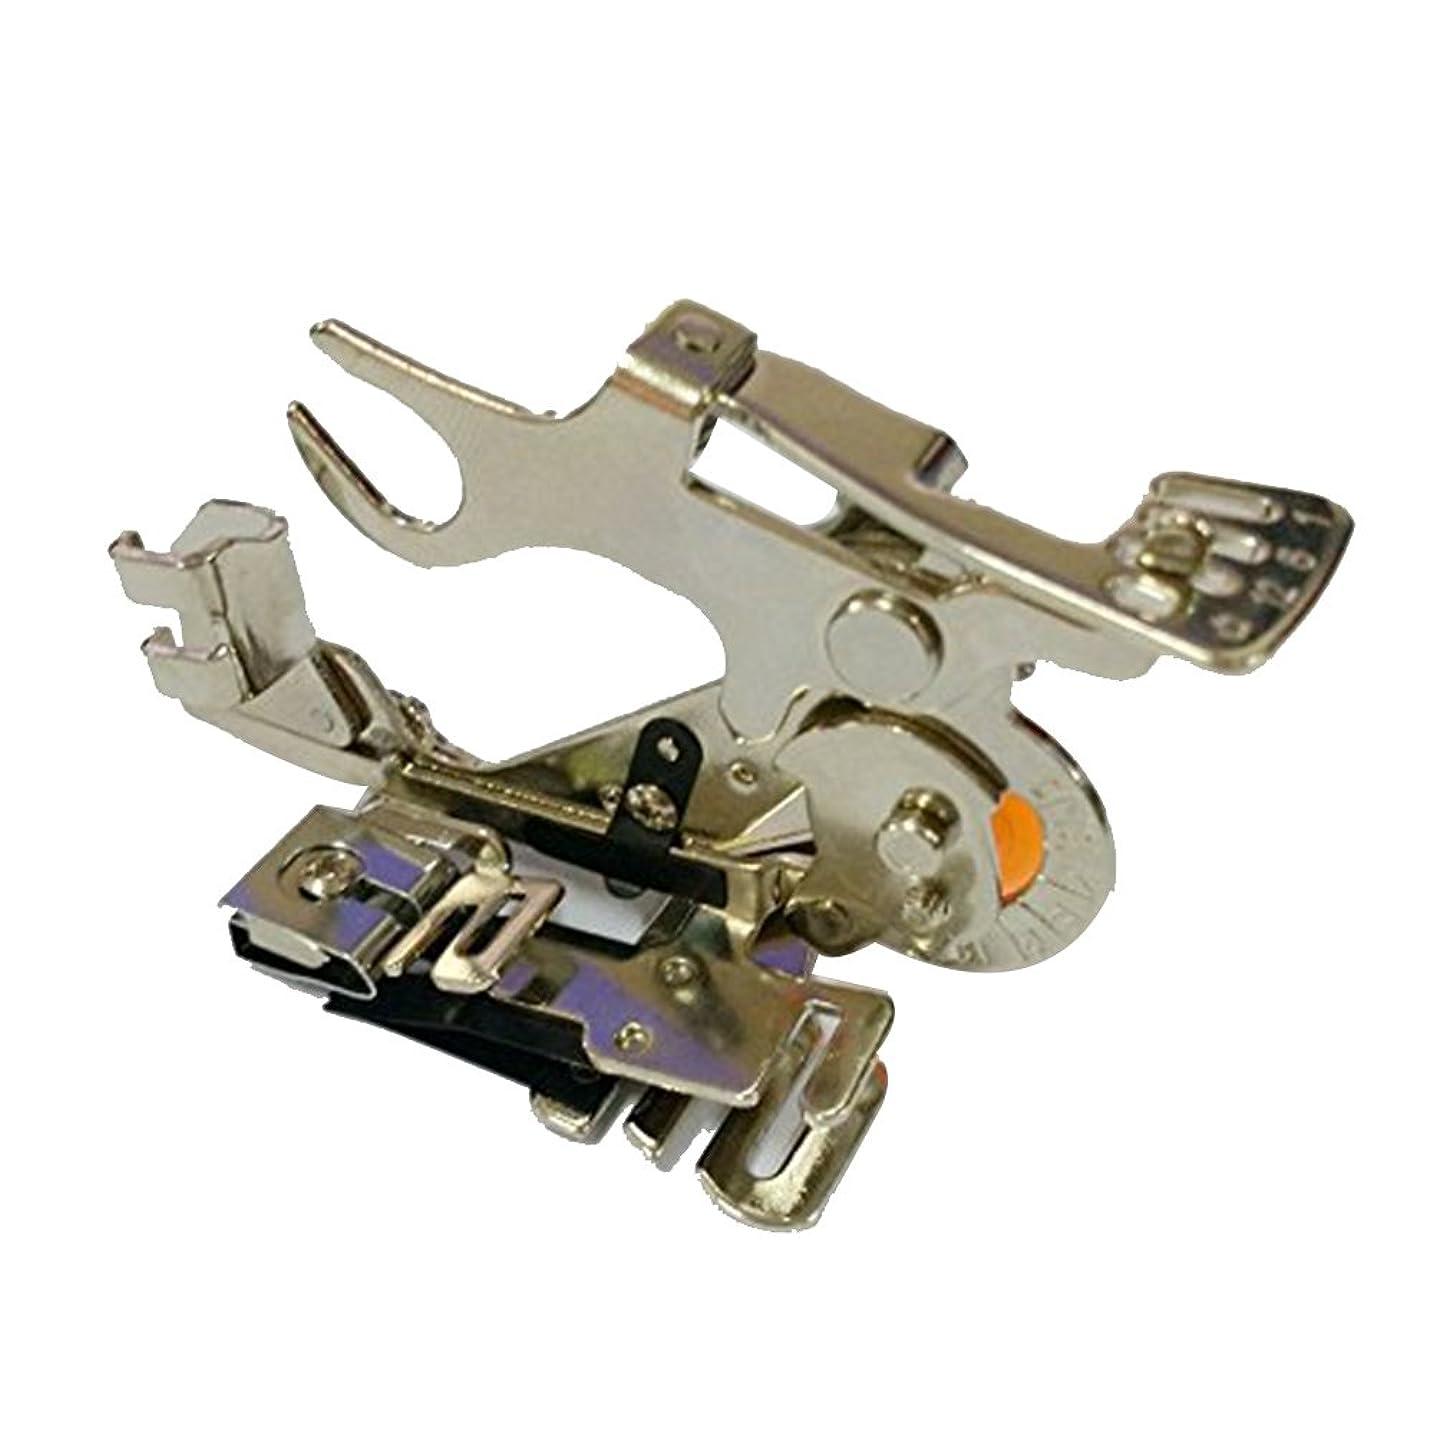 HONEYSEW Ruffler Foot for Singer Slant Shank Sewing Machines #55642S